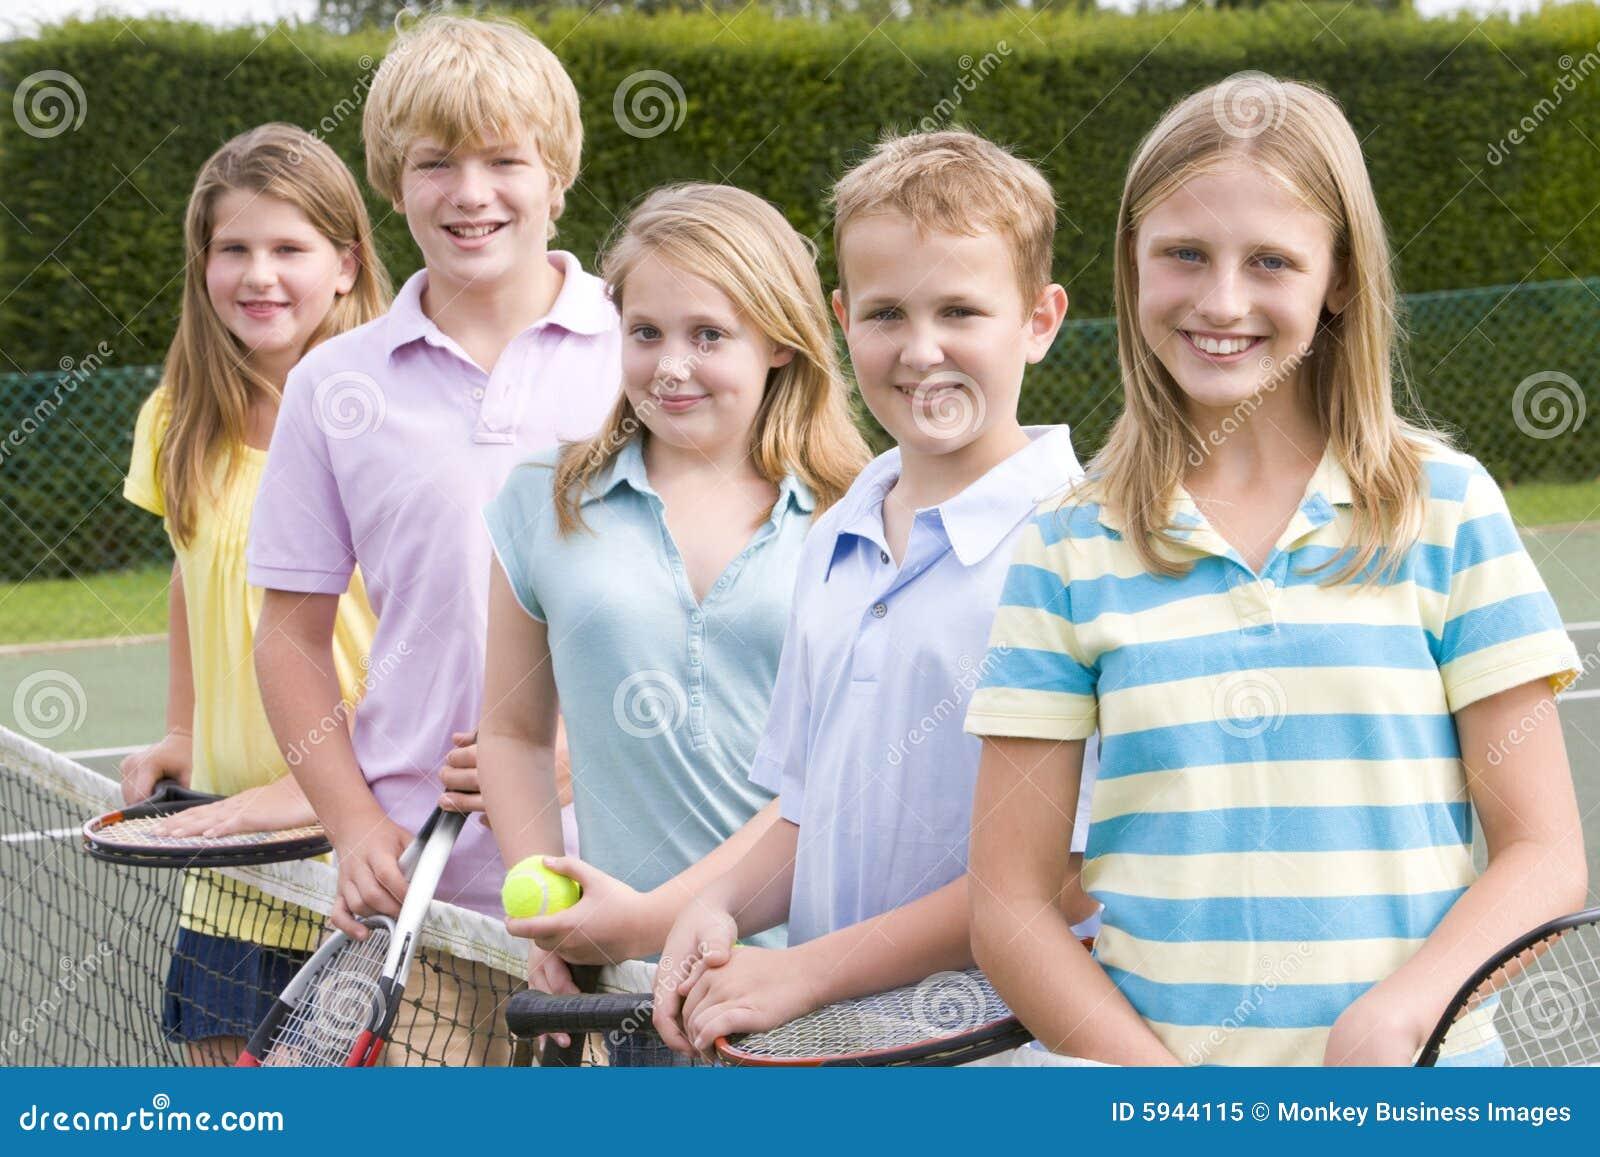 Cinco amigos novos na corte de tênis